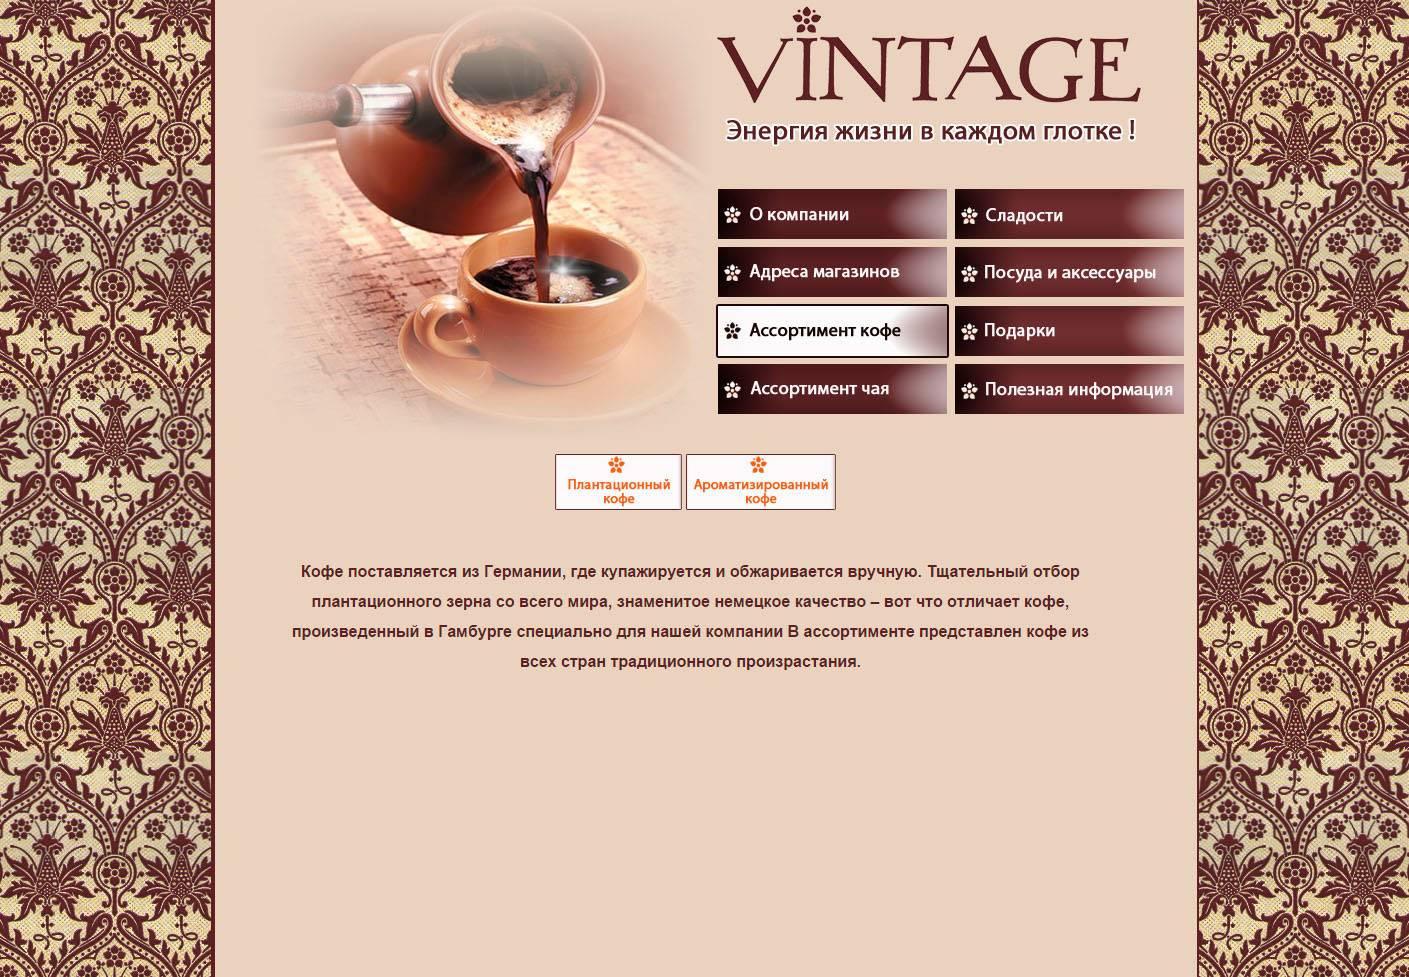 Чай и кофе винтаж